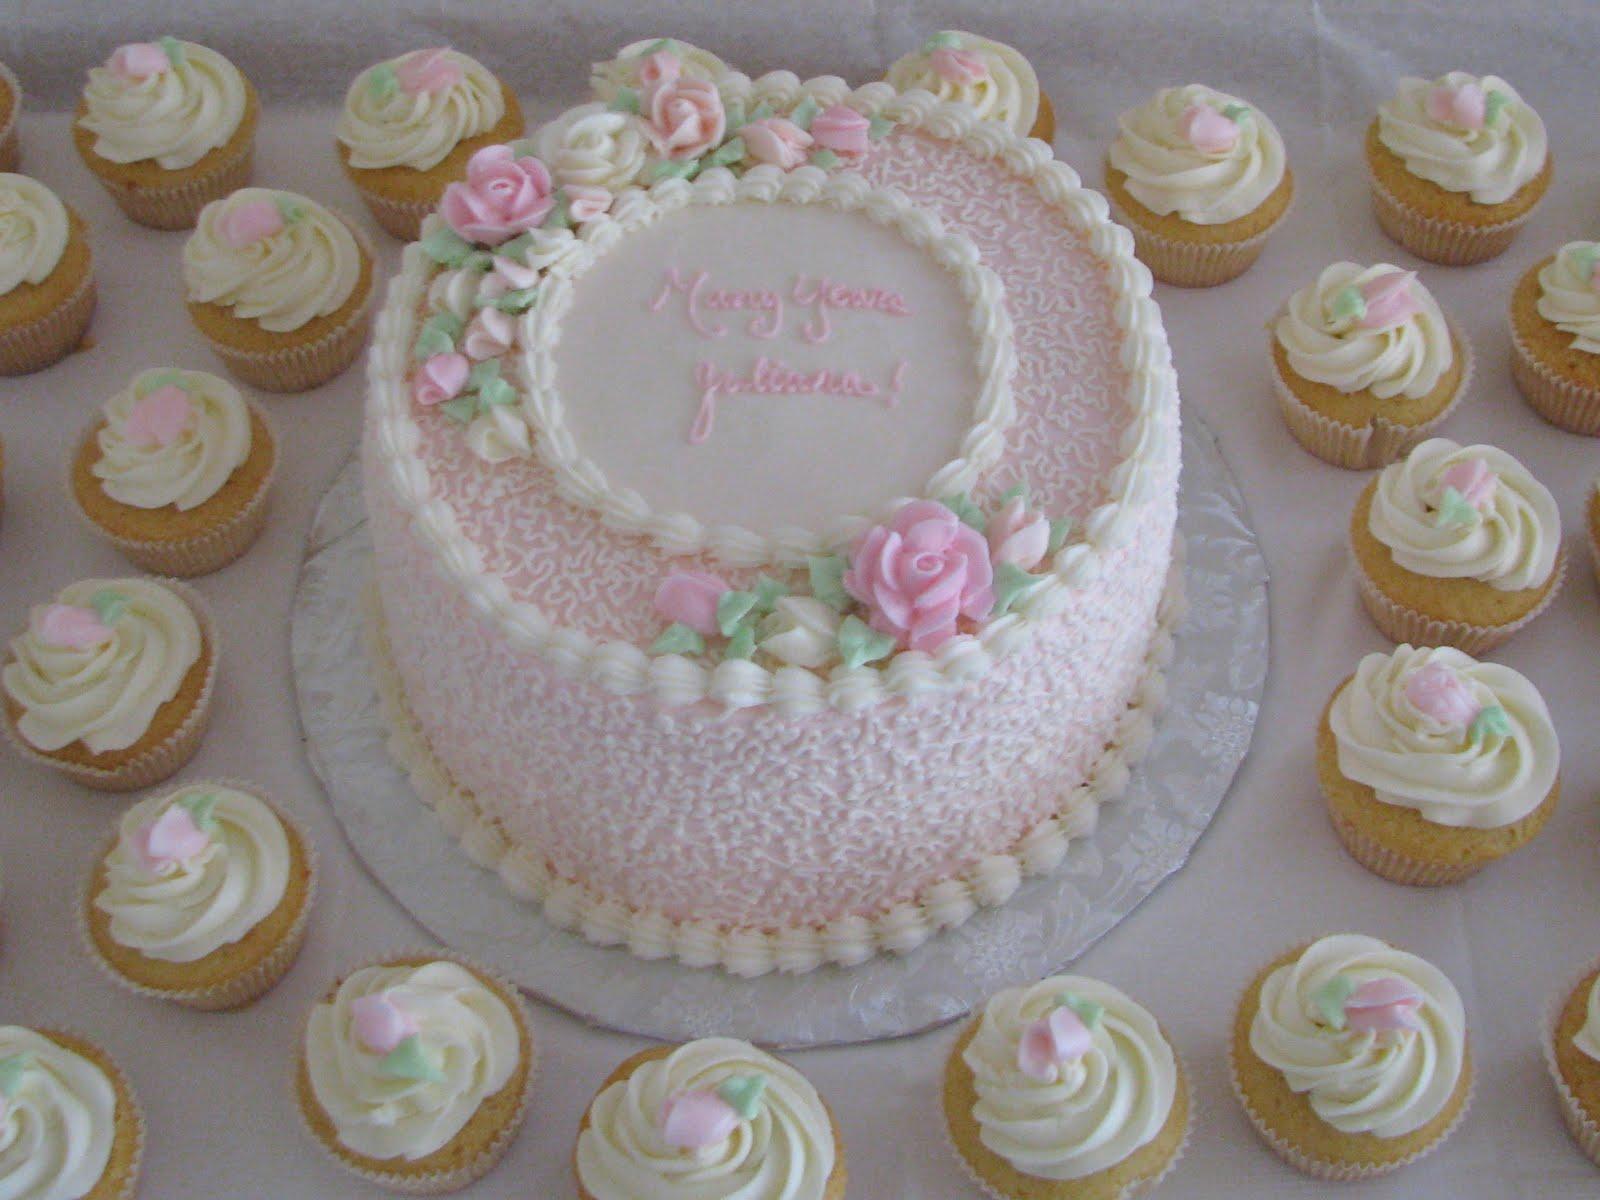 Icing Cake Design For Christening : Baptism and Christening